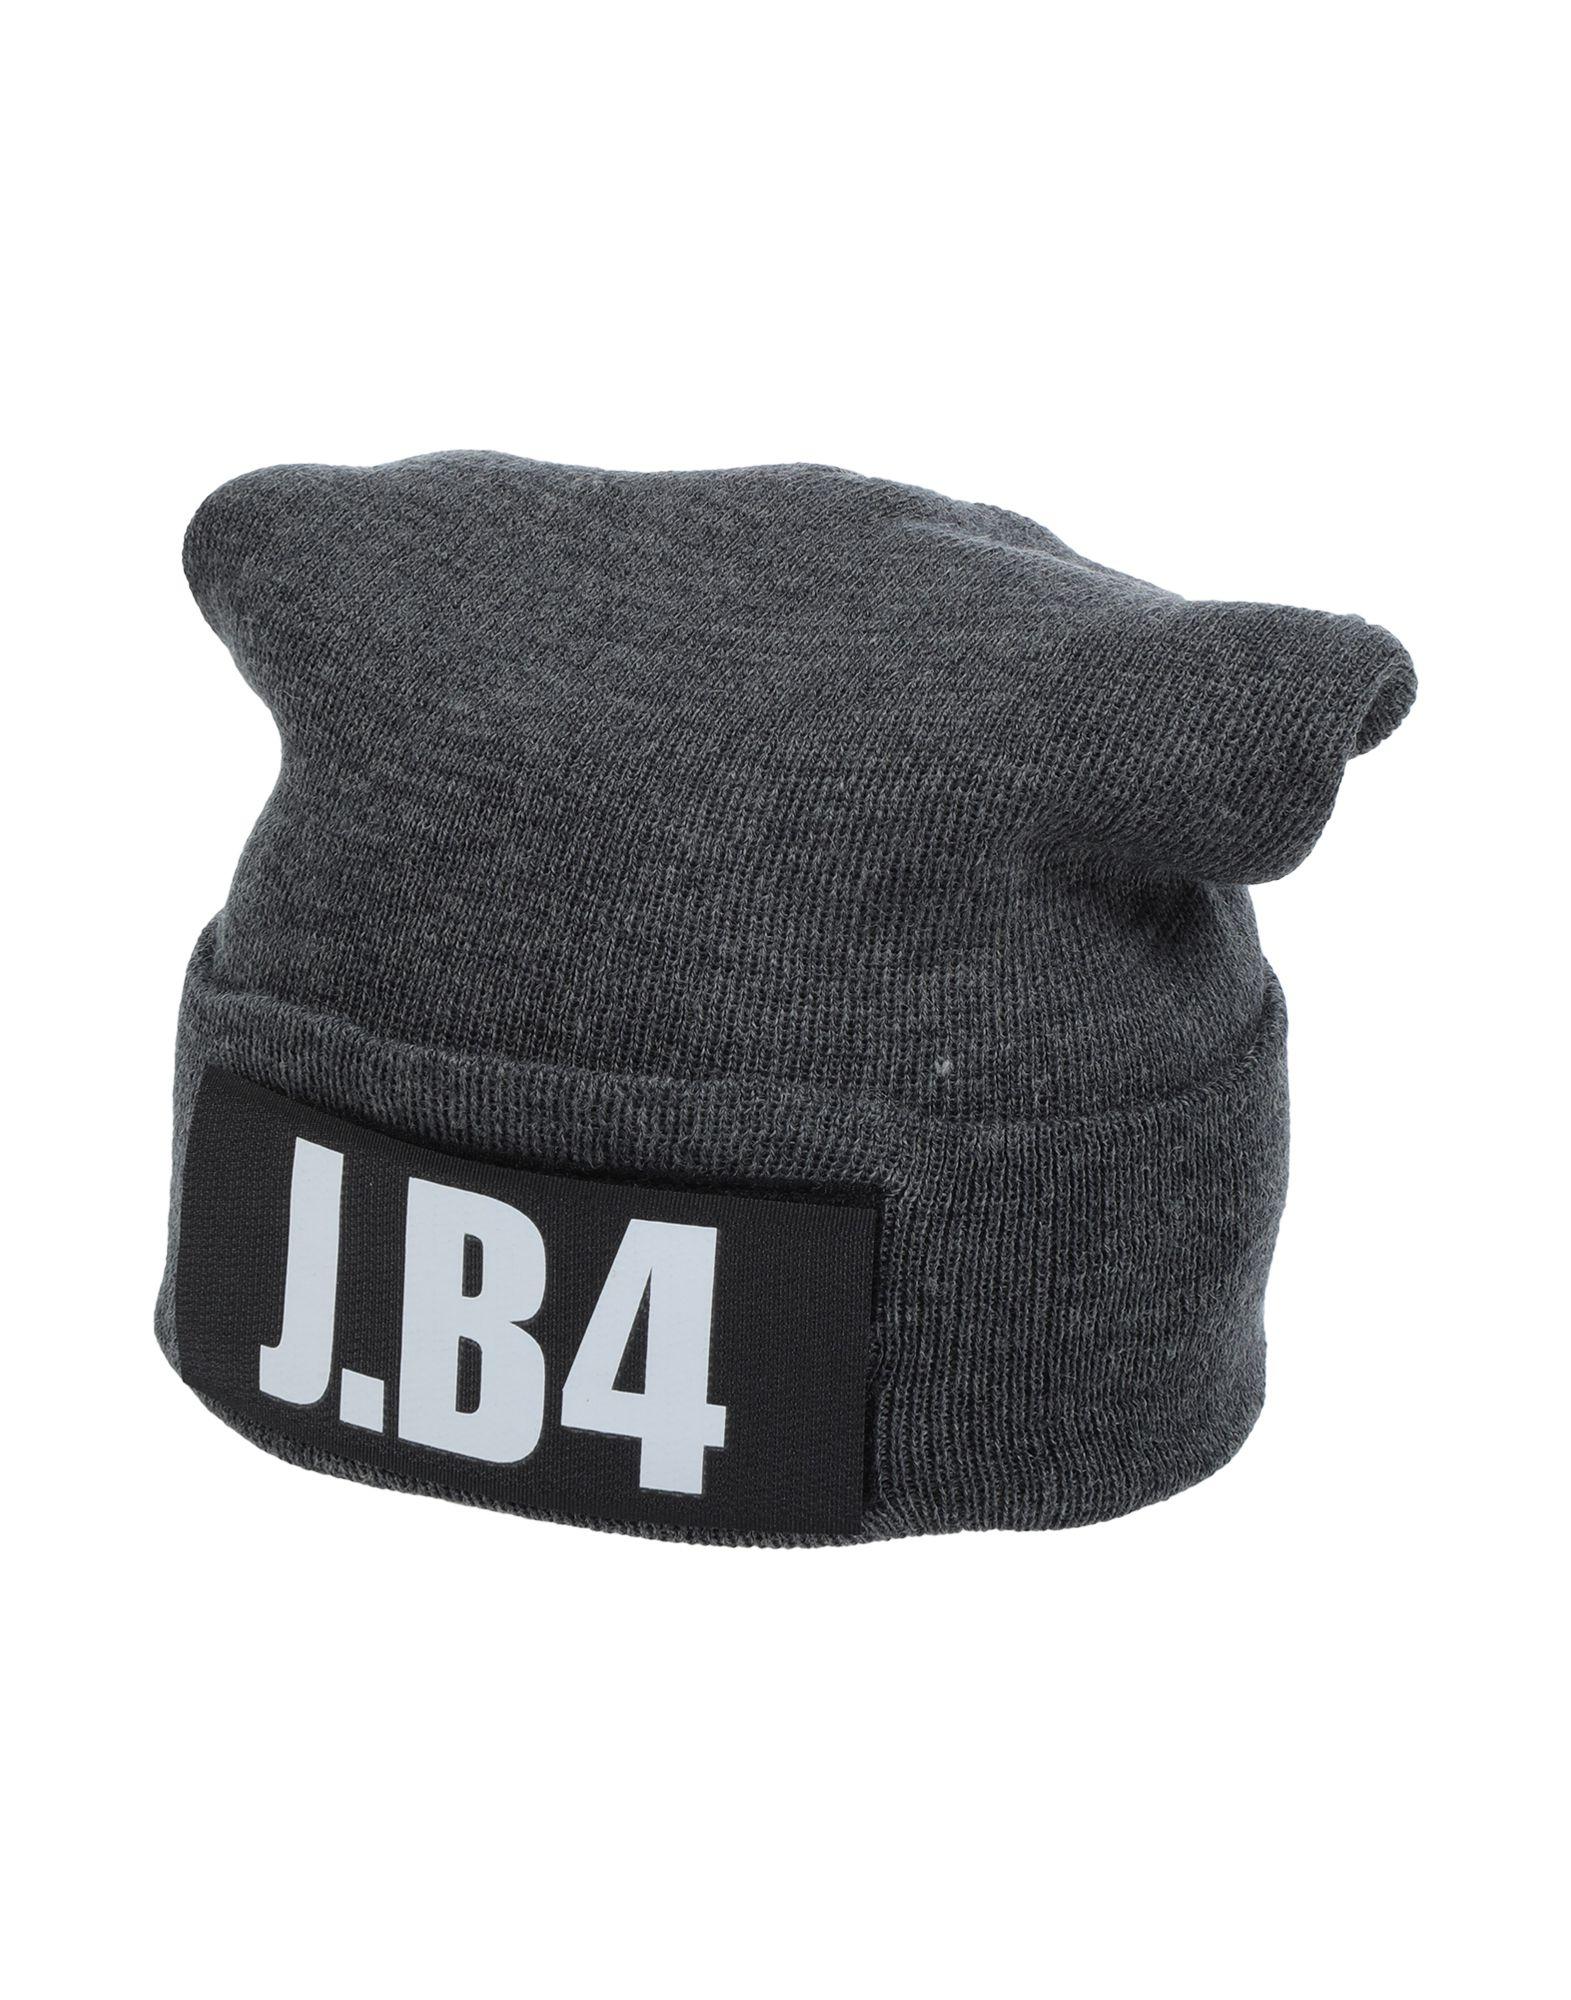 J·B4 JUST BEFORE Головной убор